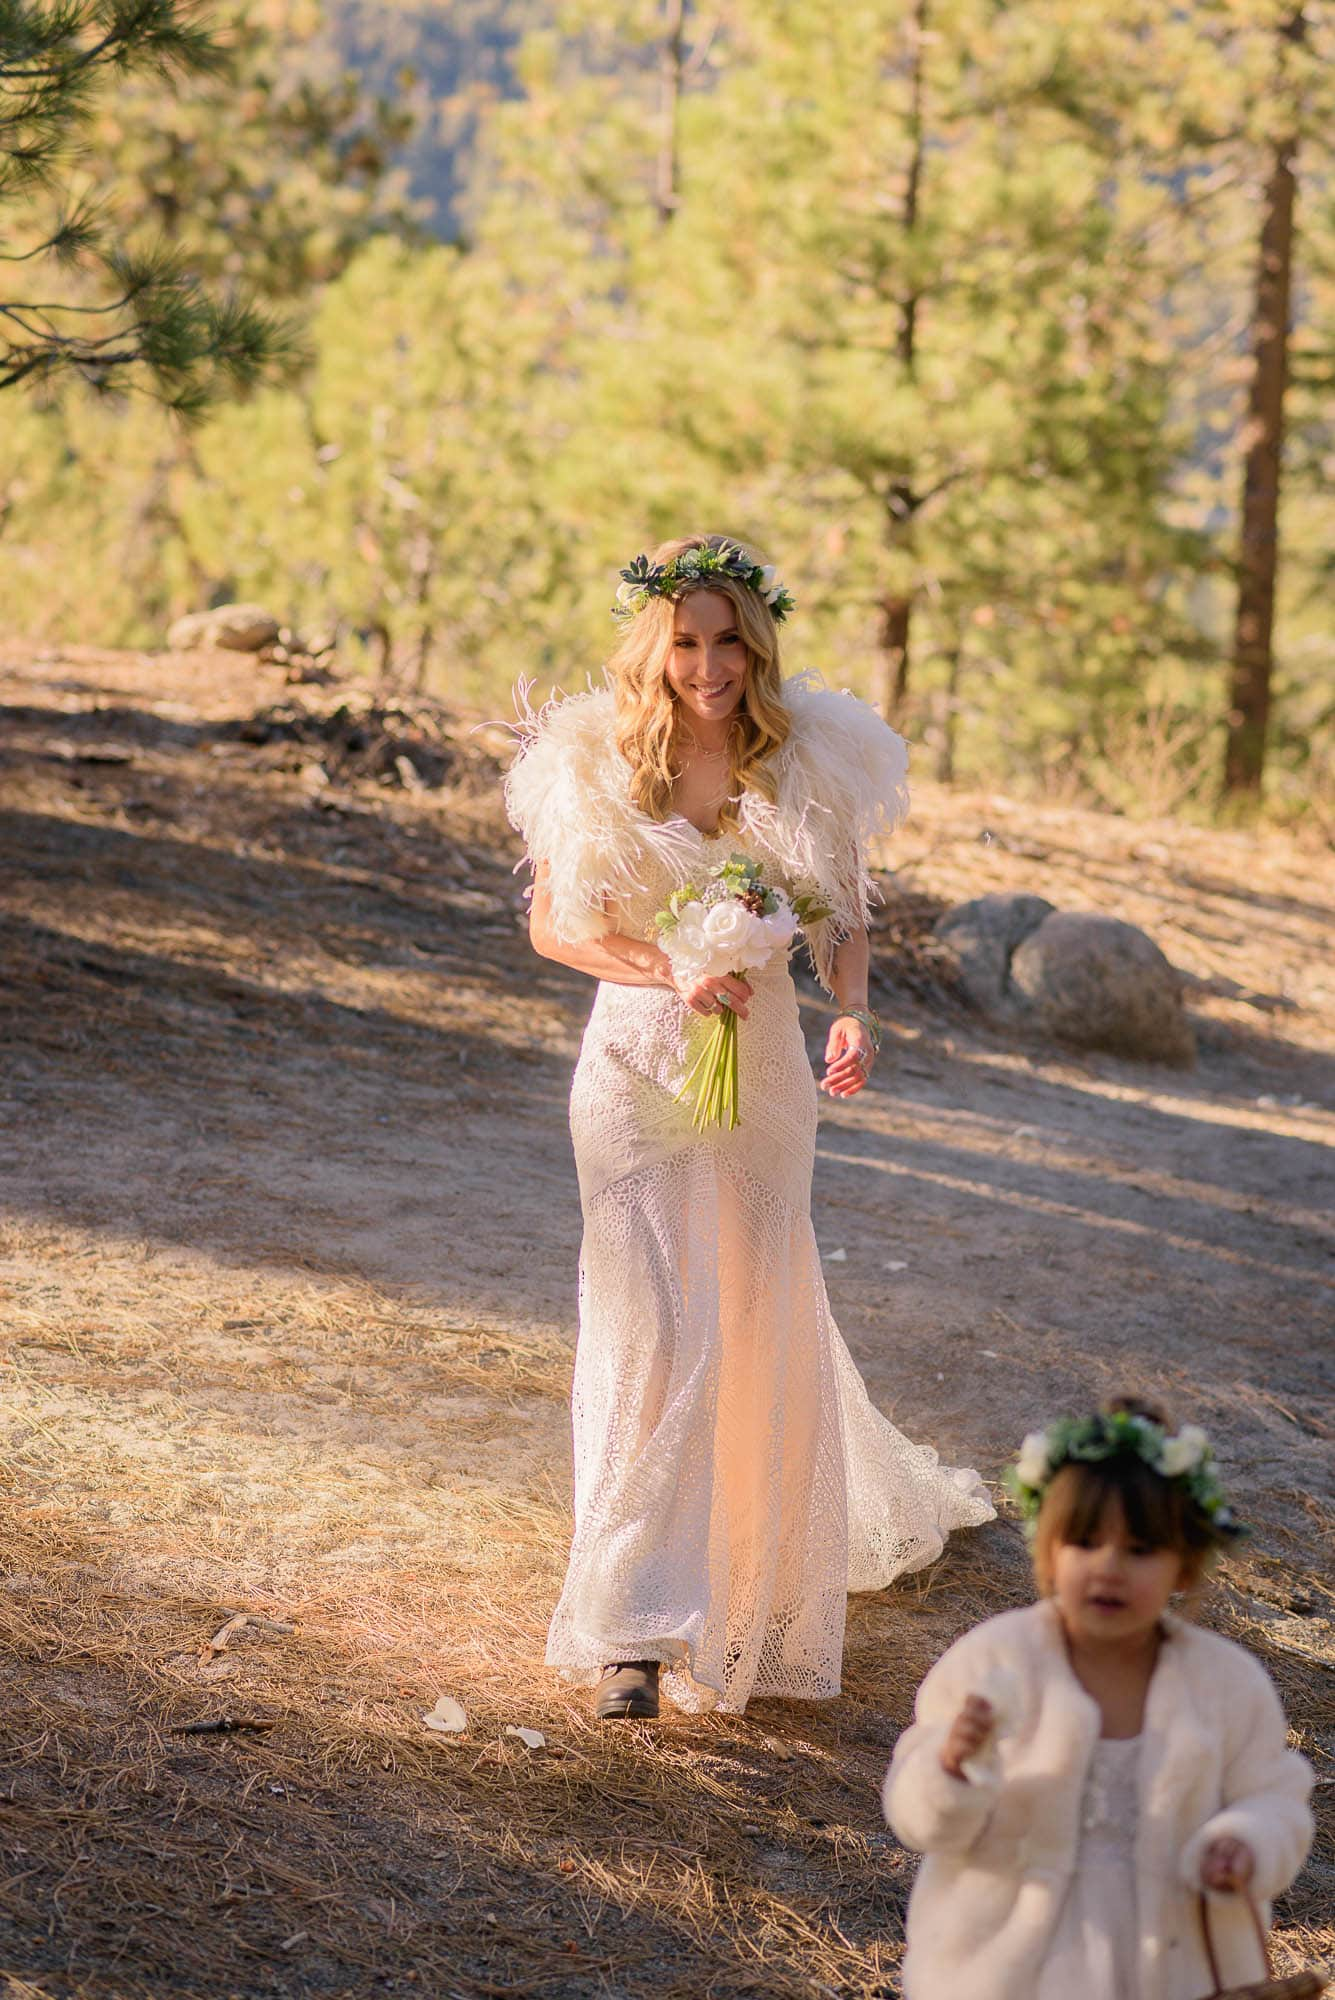 006_Alan_and_Heidi_Wedding_Natalie_Mike